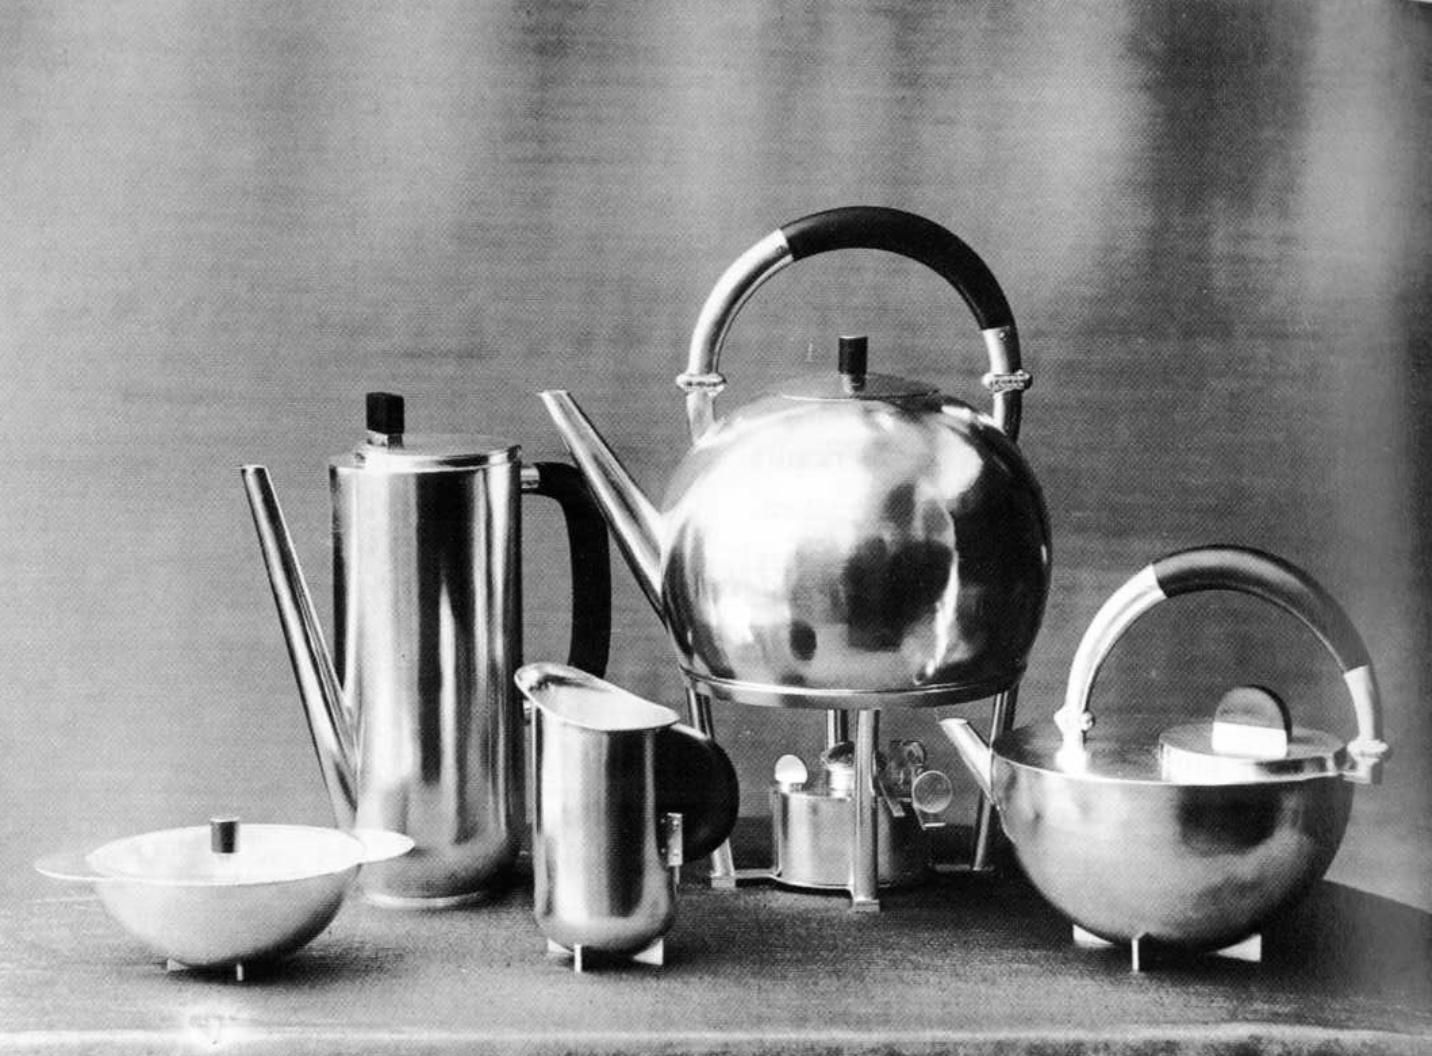 Bauhaus pendant lamp marianne brandt and hans przyrembel 1925 - The School Of Bauhaus Coffee And Tea Set 1924 Design By Marianne Brandt